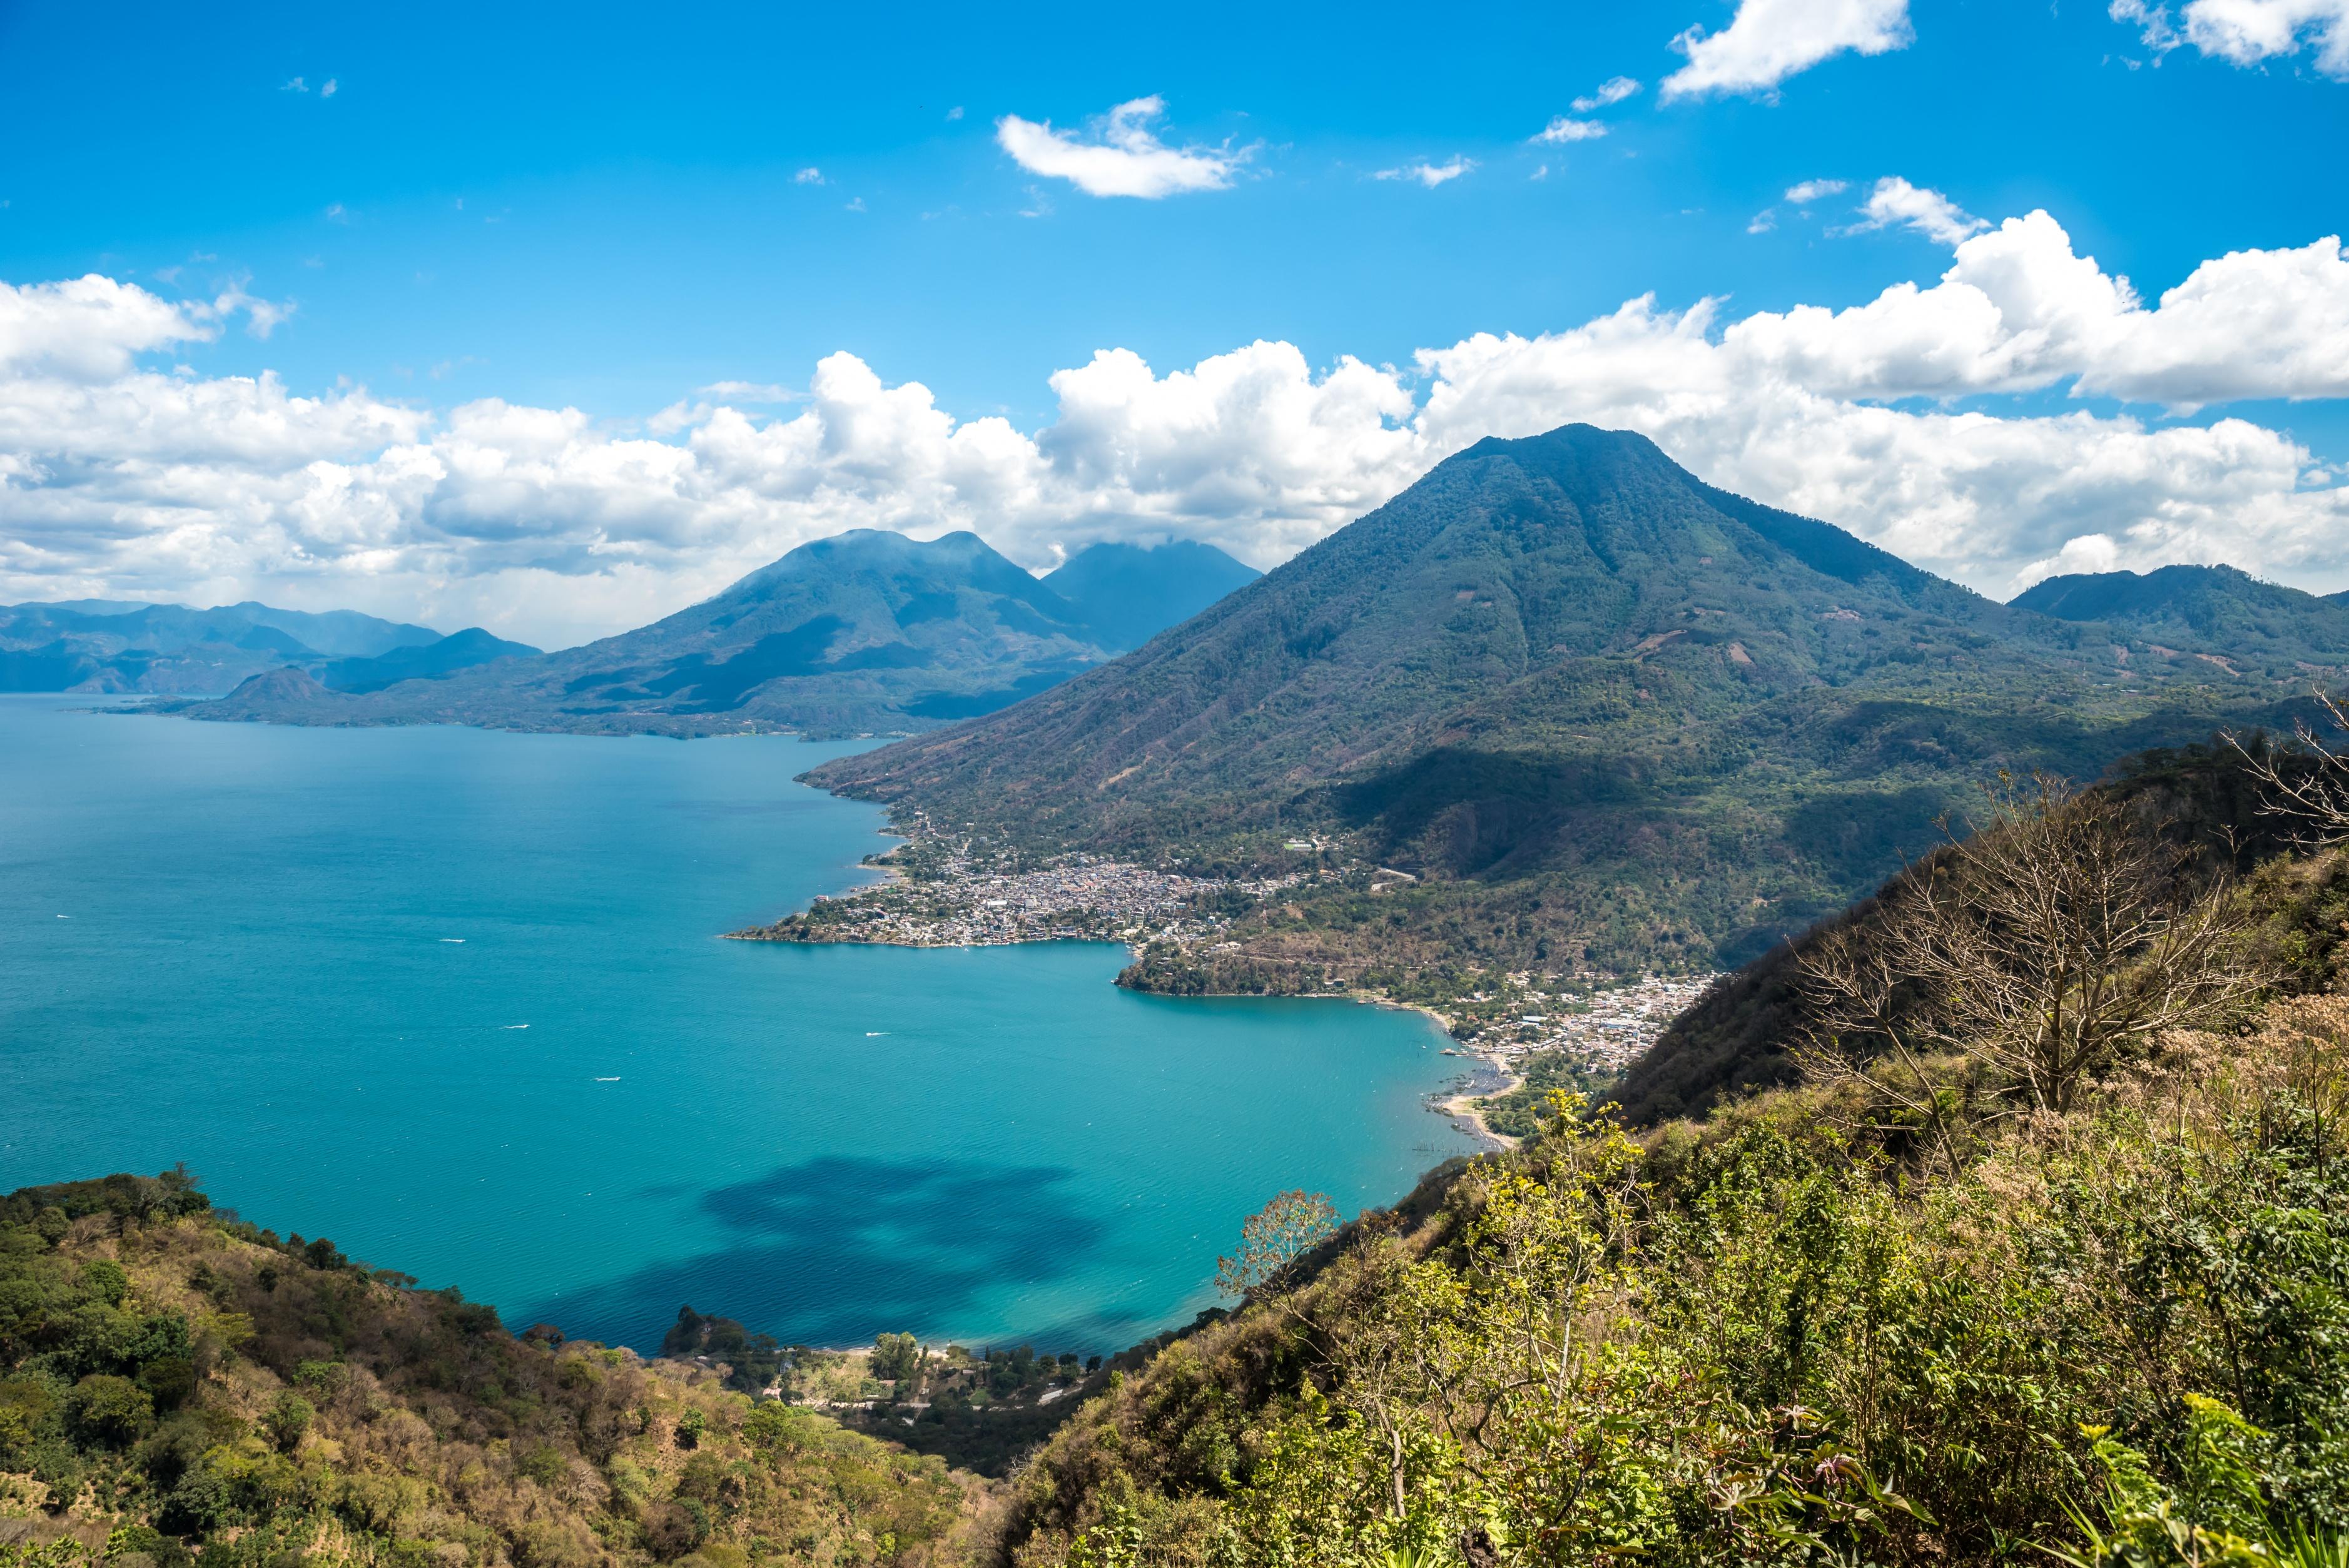 Nom : Lac Atitlan PVT Guatemala.jpg Affichages : 152 Taille : 3,37 Mo